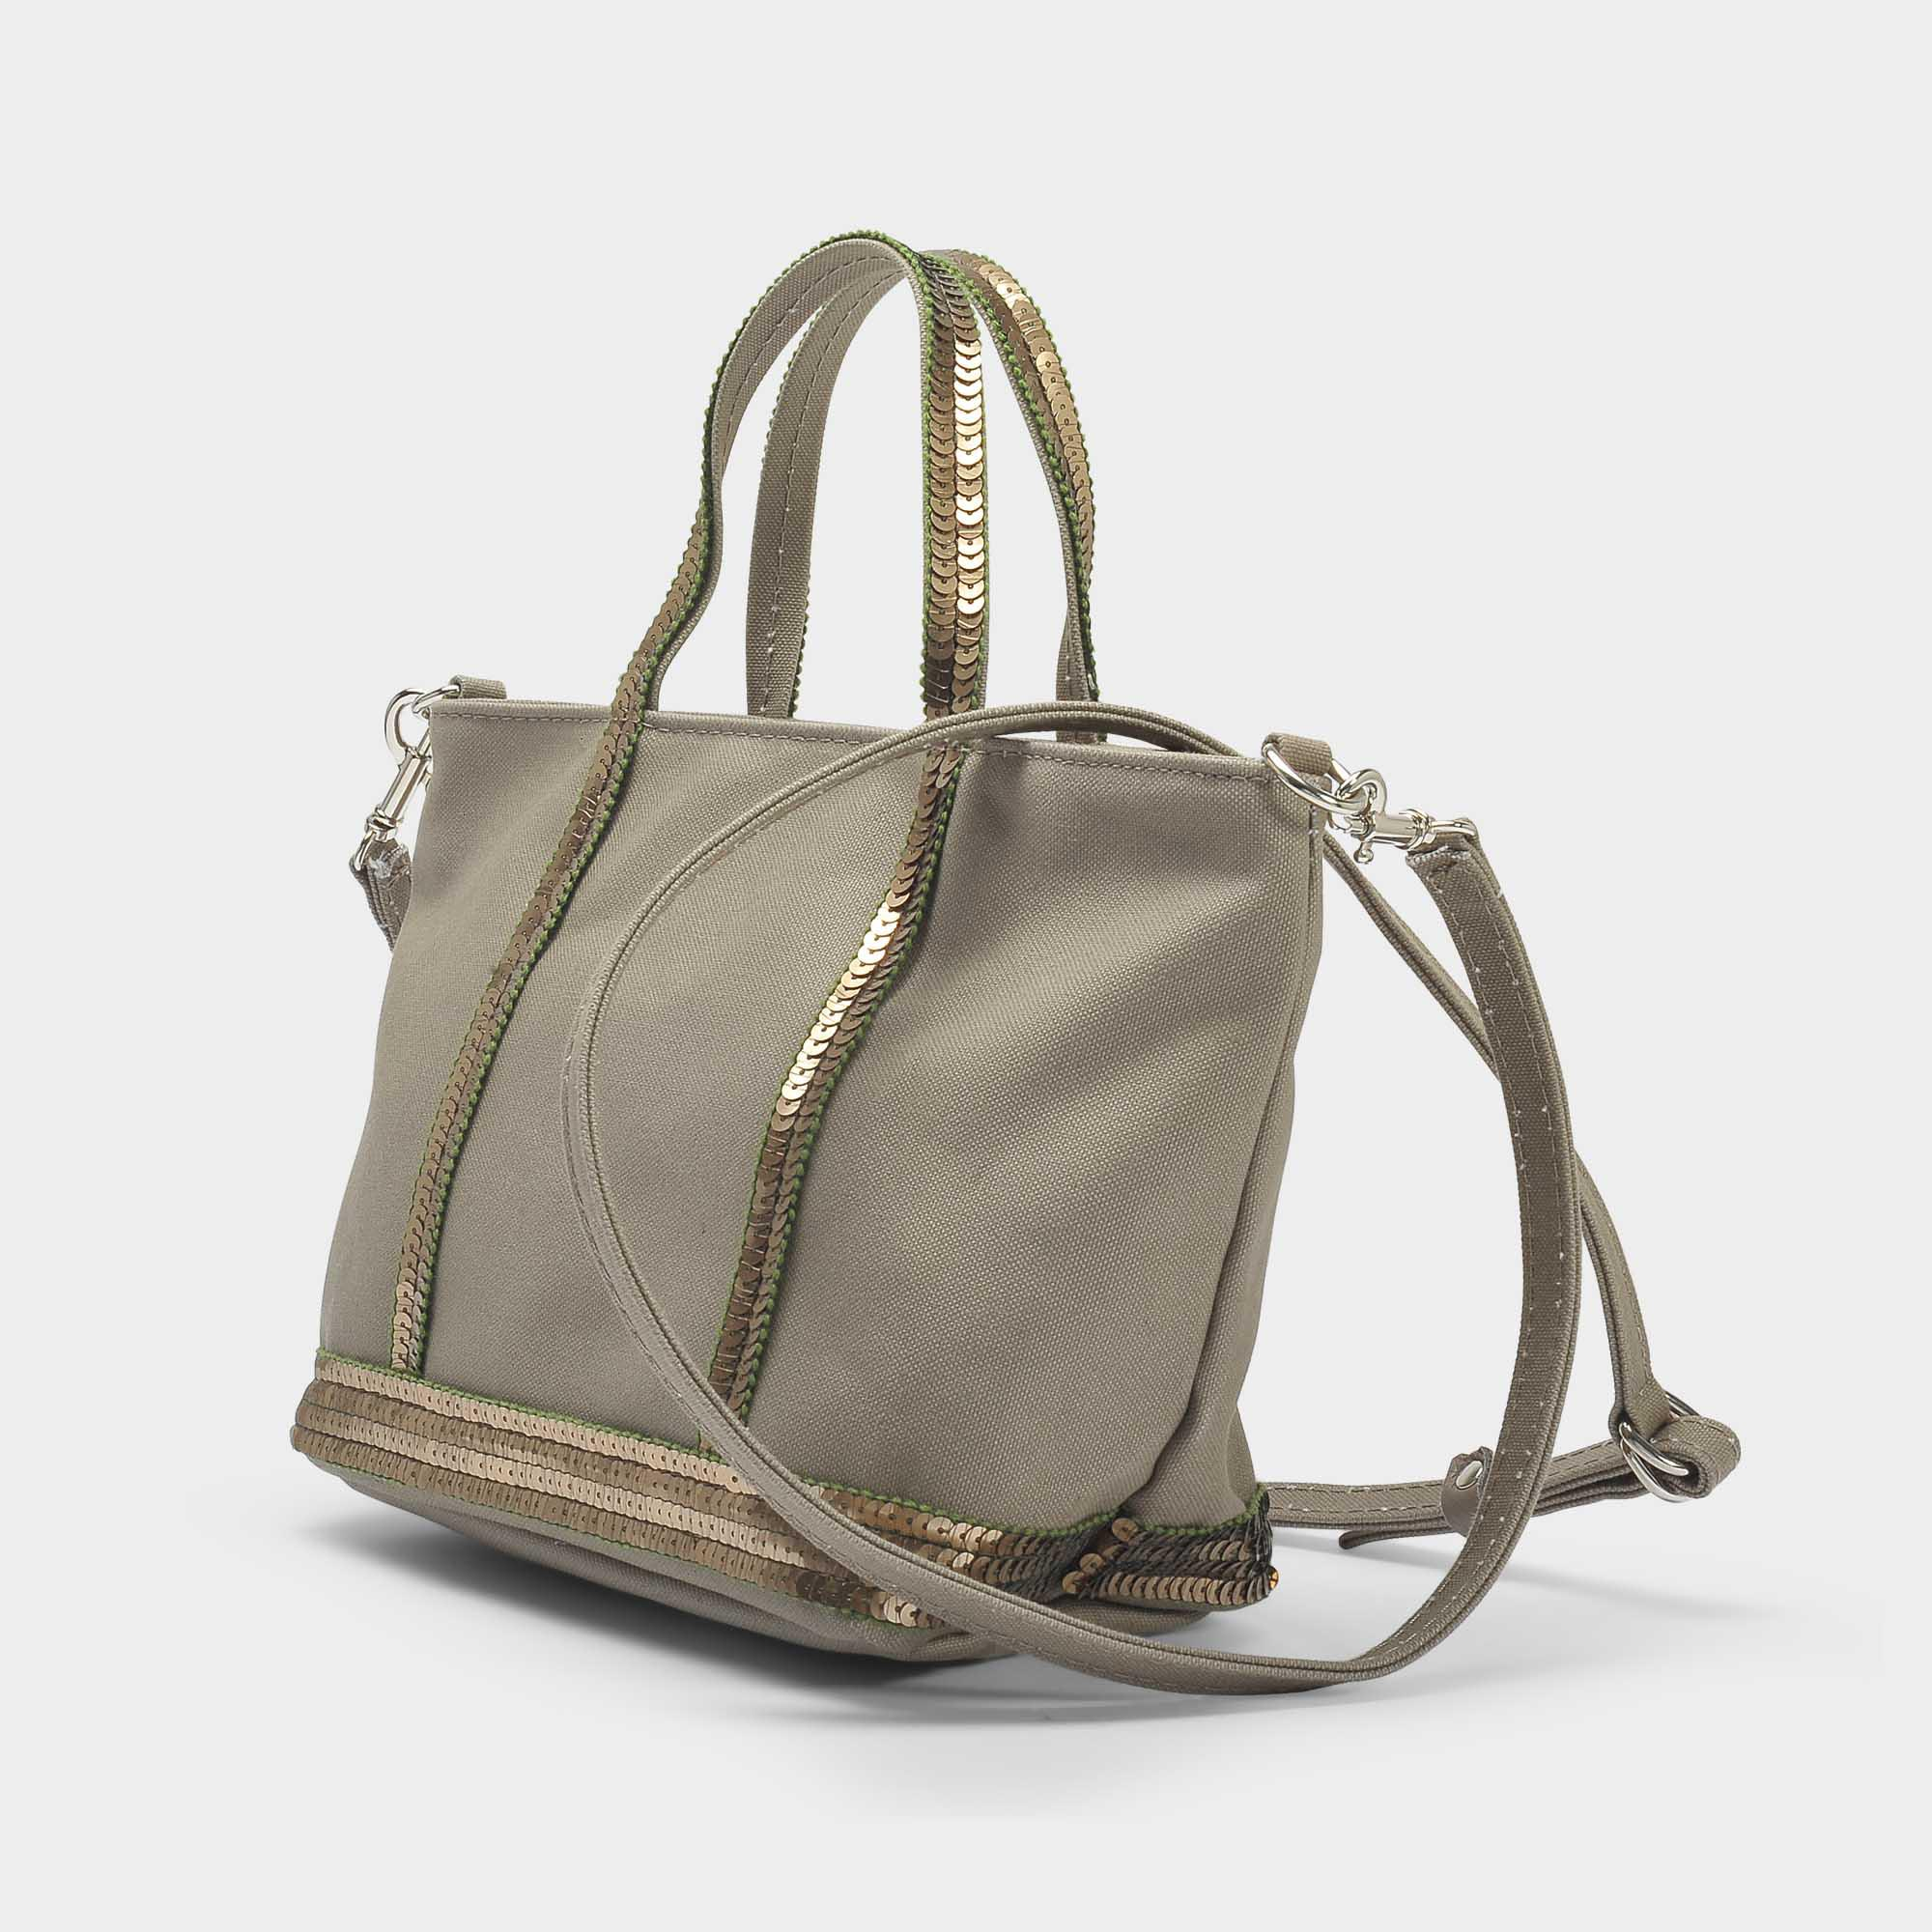 Vanessa Bruno Canvas And Sequins Baby Tote Bag In Safari Cotton